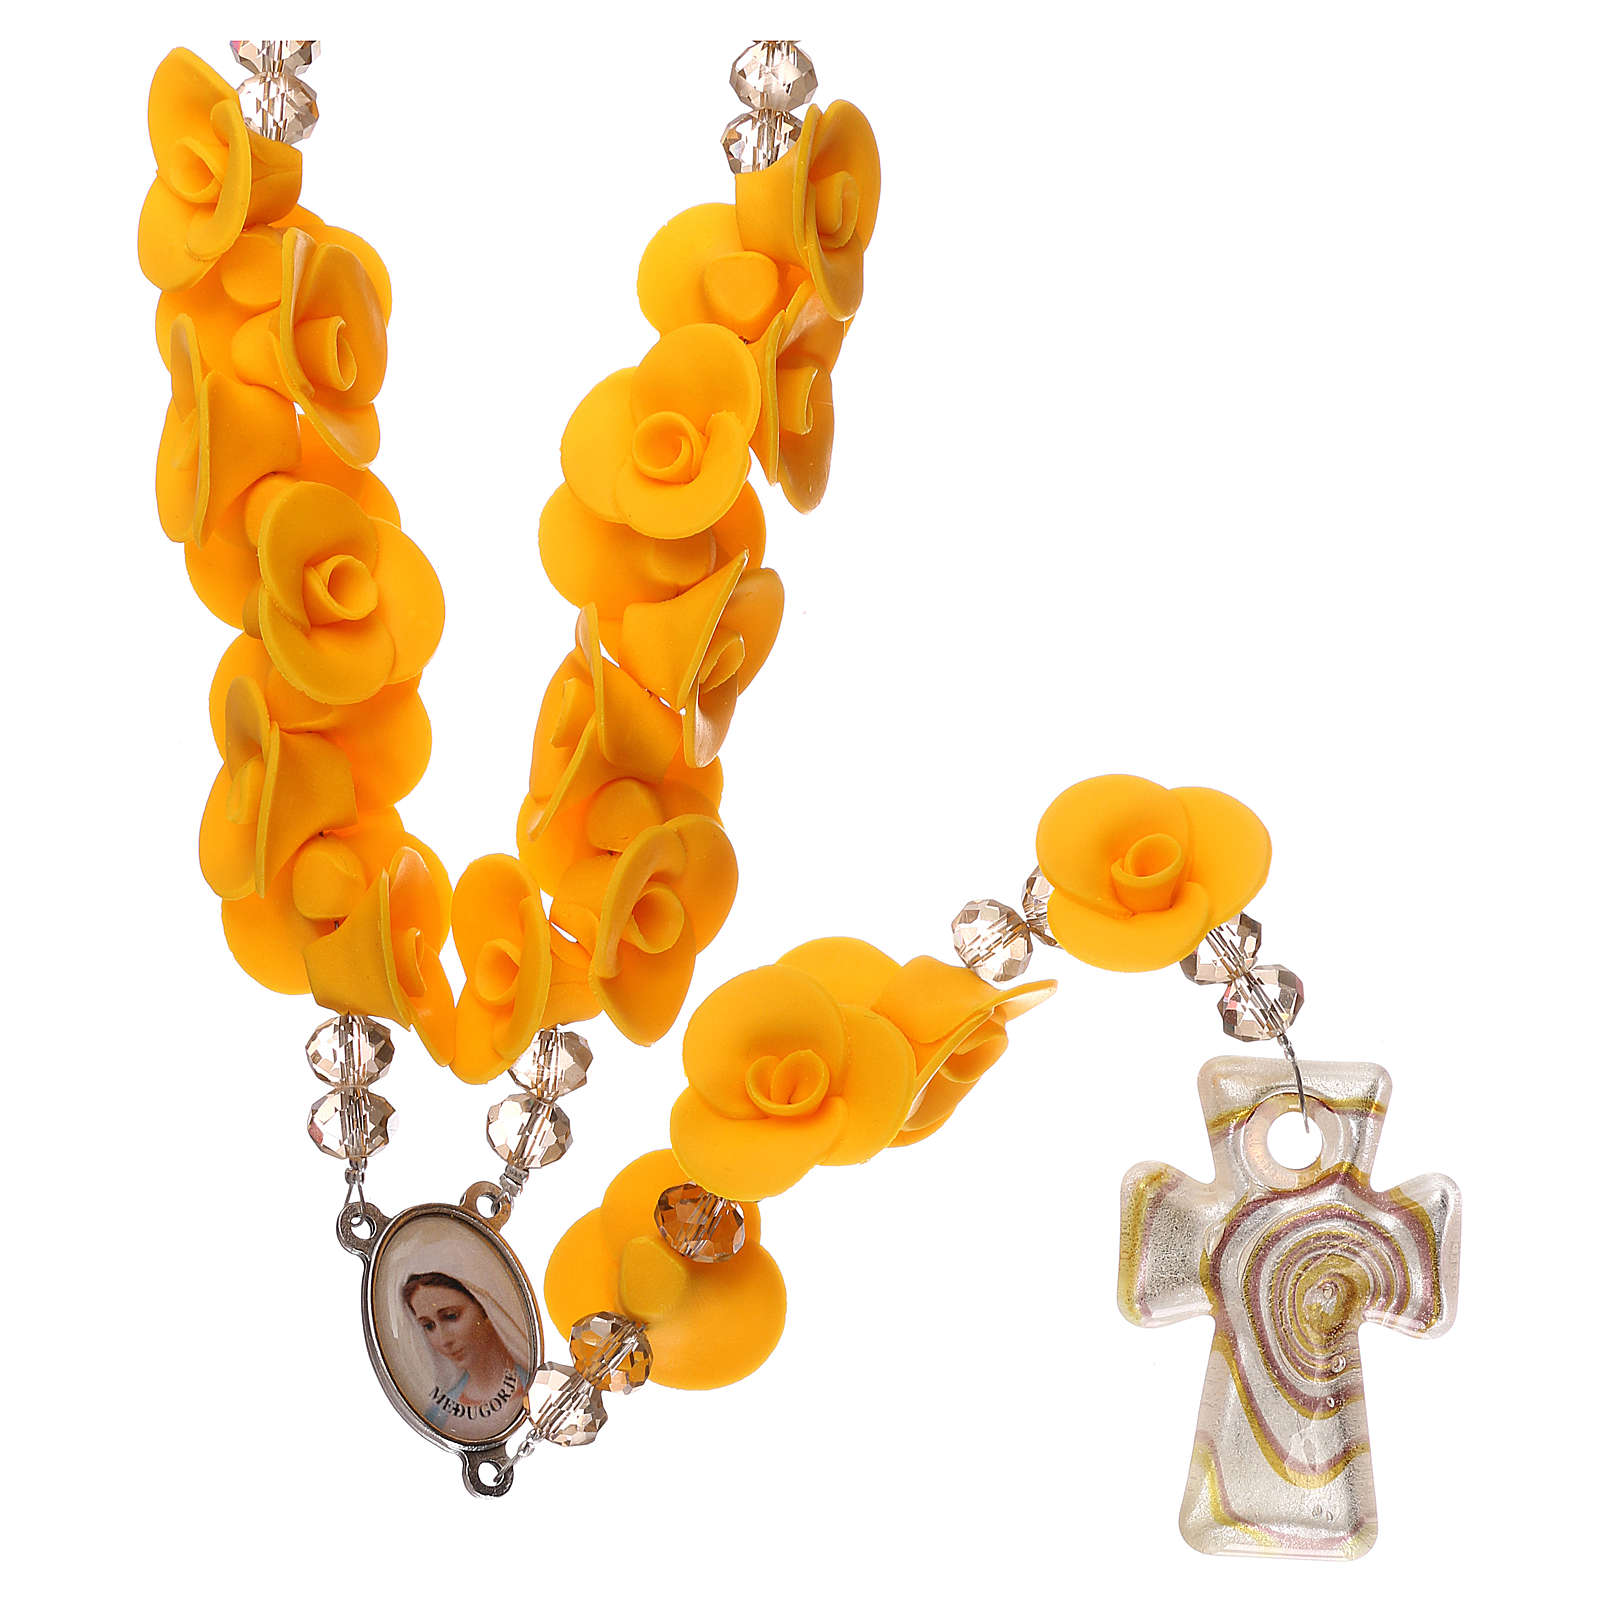 Chapelet Medjugorje roses jaunes croix verre Murano 4